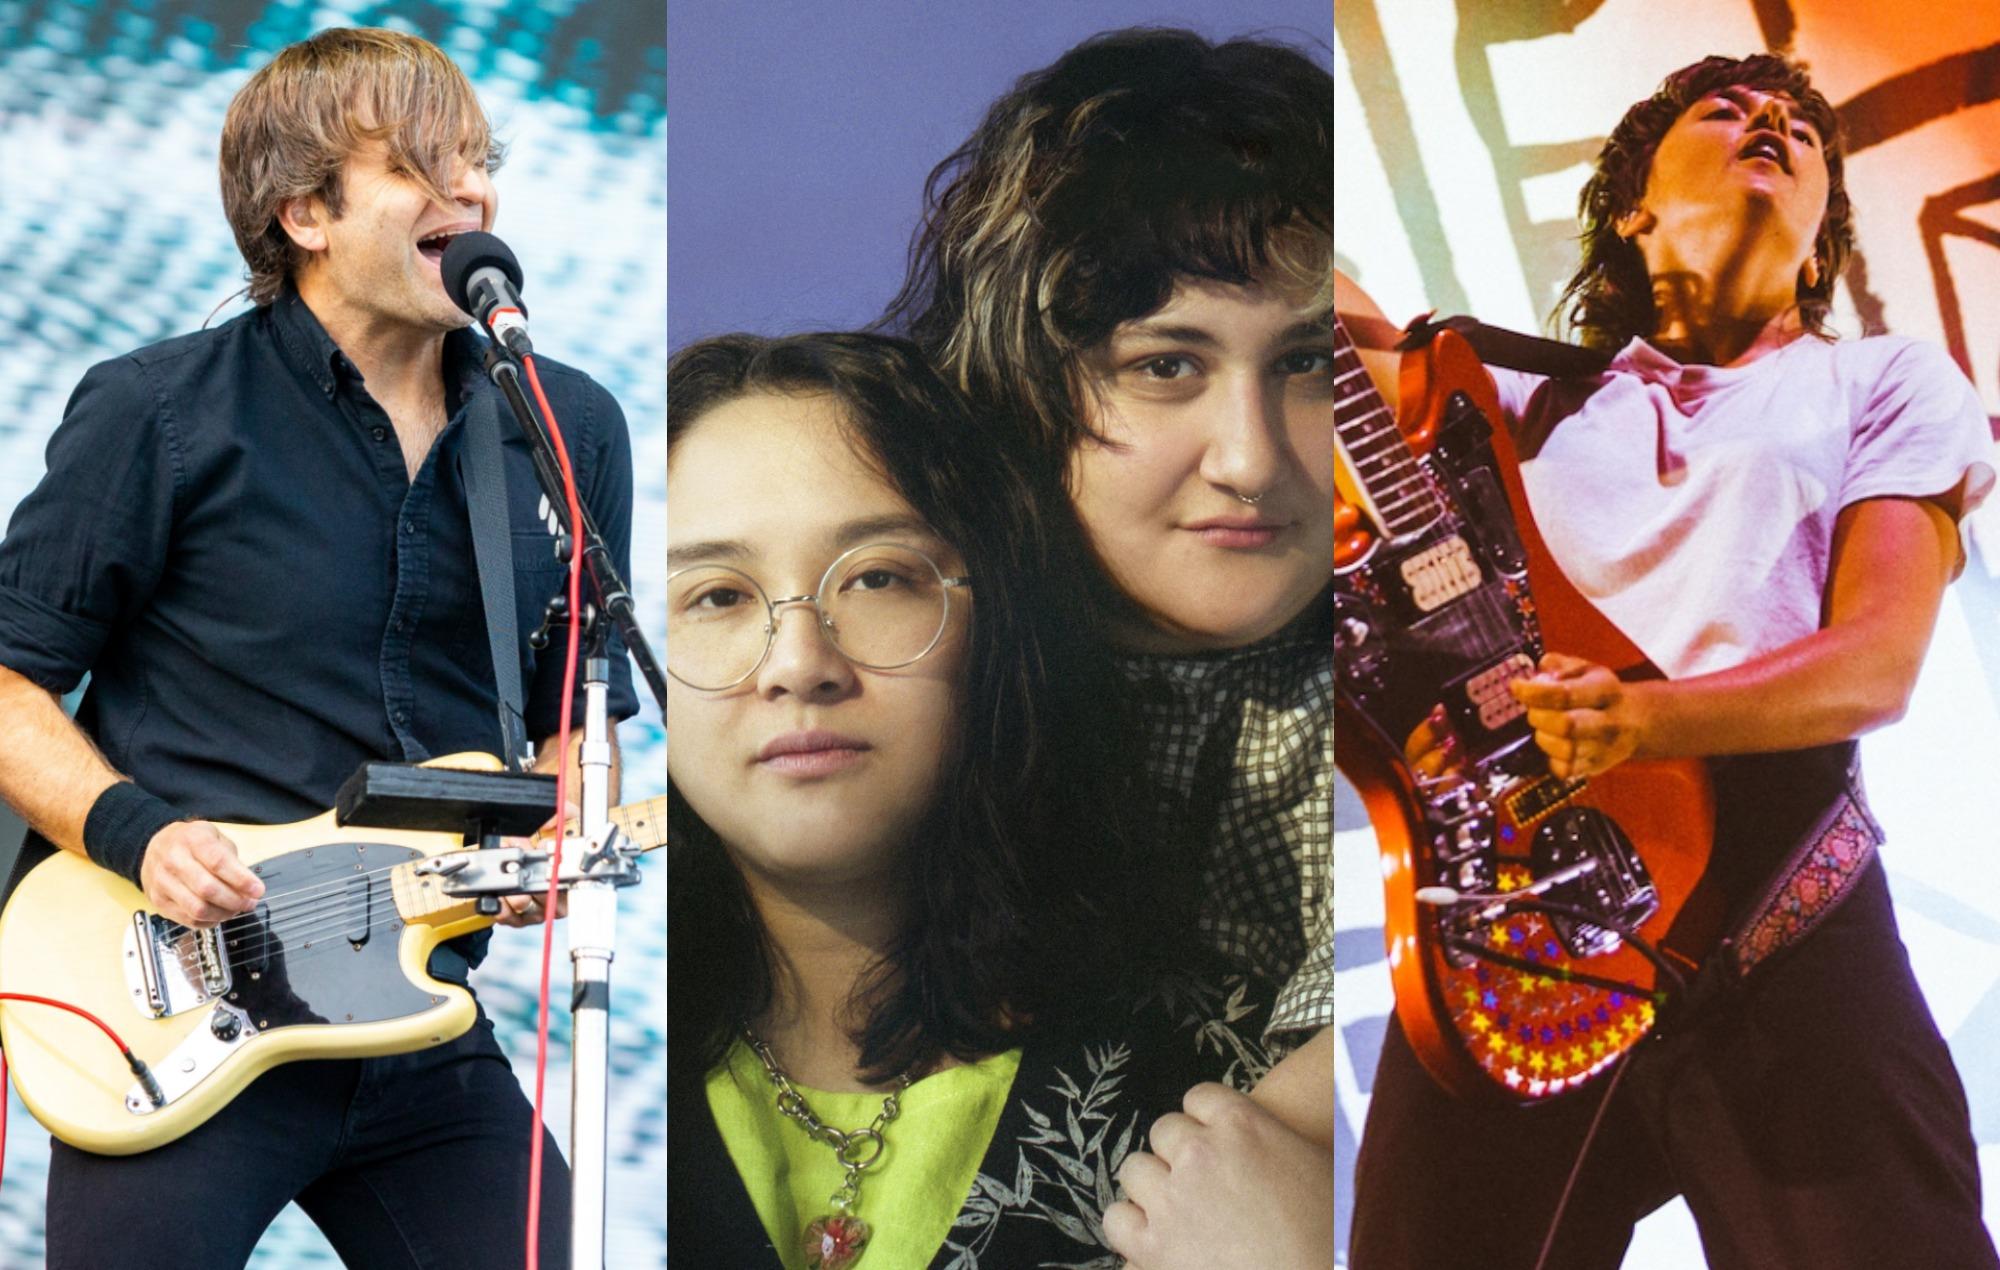 Jay Som and Palehound announce livestream festival with Courtney Barnett, Ben Gibbard and more